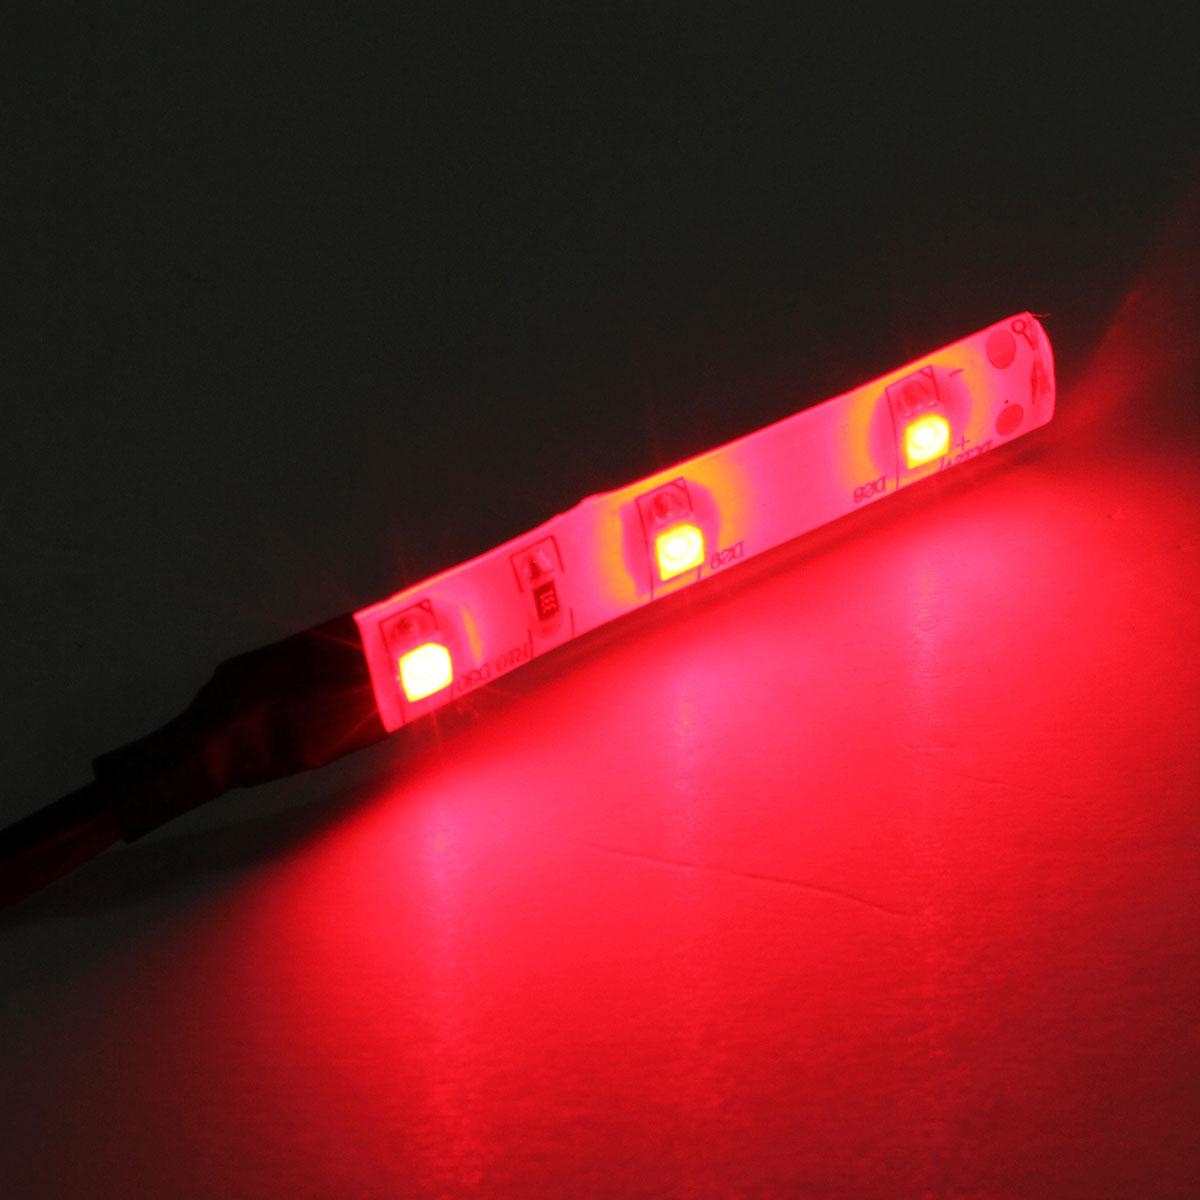 4 x 30cm Waterproof 15 3528 SMD Flexible LED Light Lamp Strip Red DC 12V /& G4T6